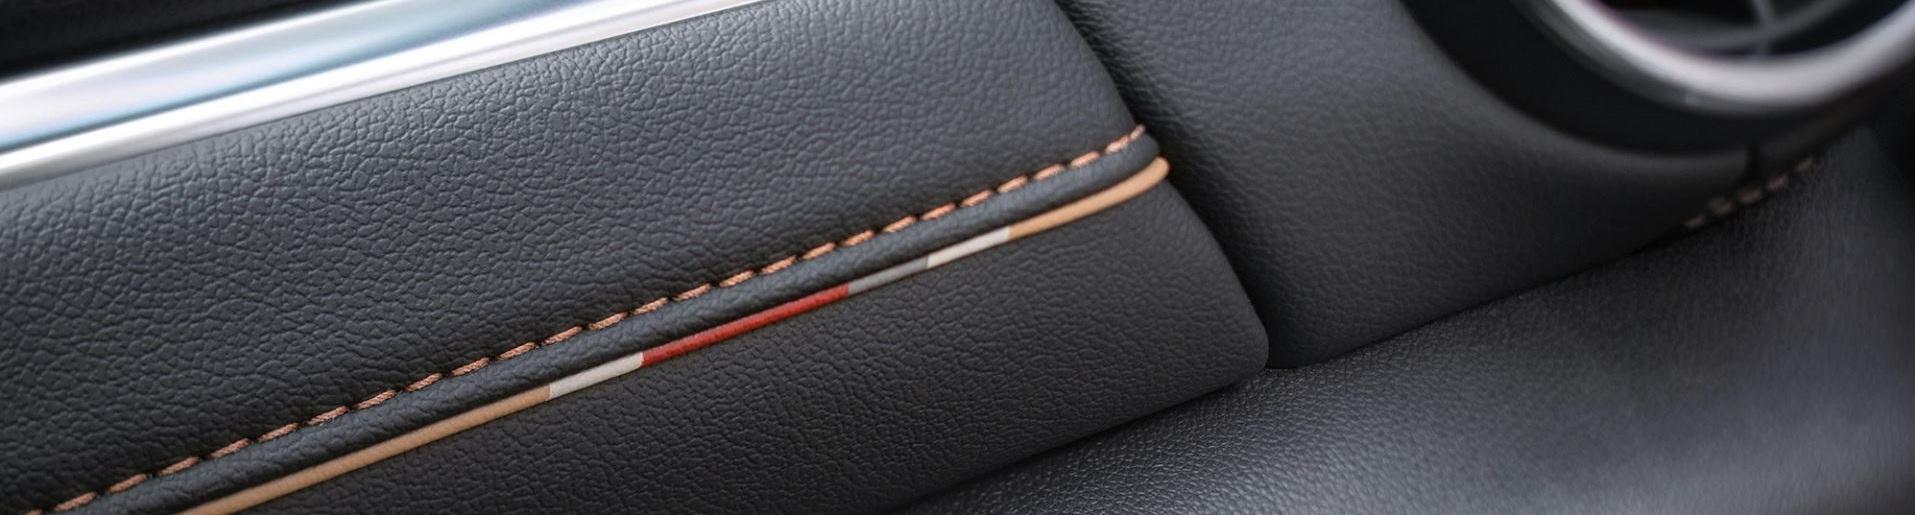 2020 Chevrolet Blazer Interior Detailing